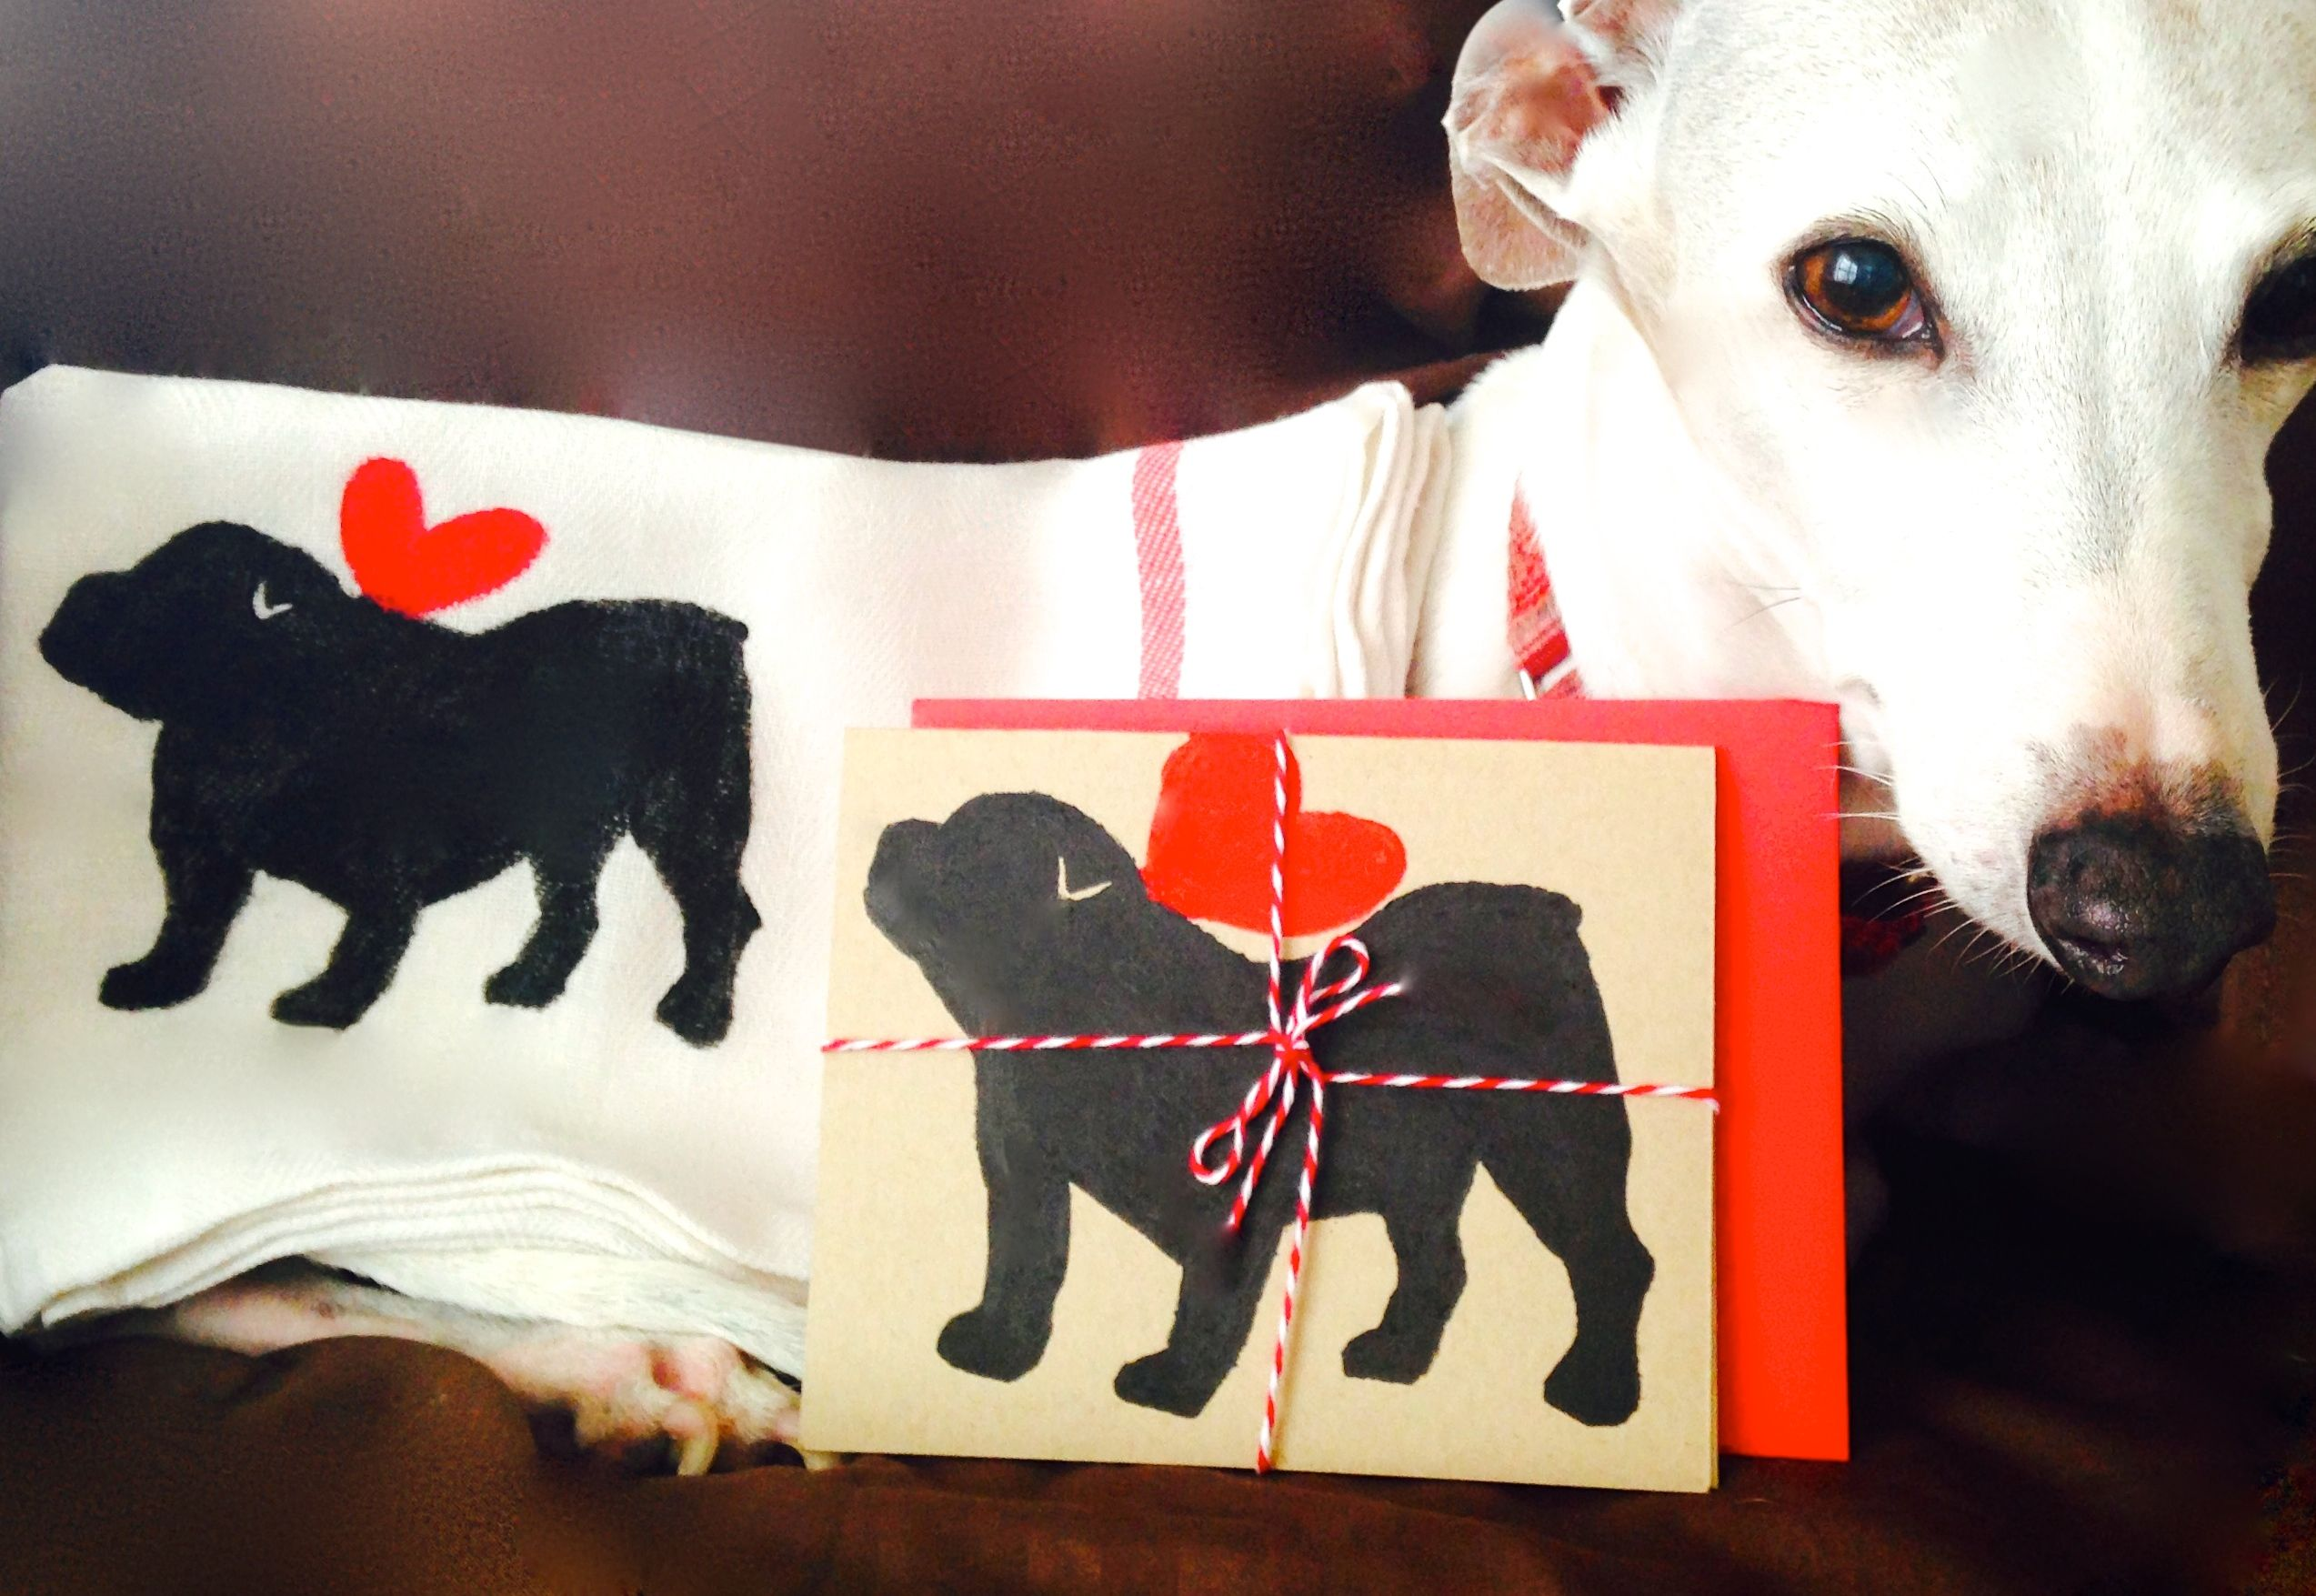 English Bulldog Towel Bull Dog Kitchen Tea Decor ECO Friendly % To ANIMAL  RESCUE Dish Cloth